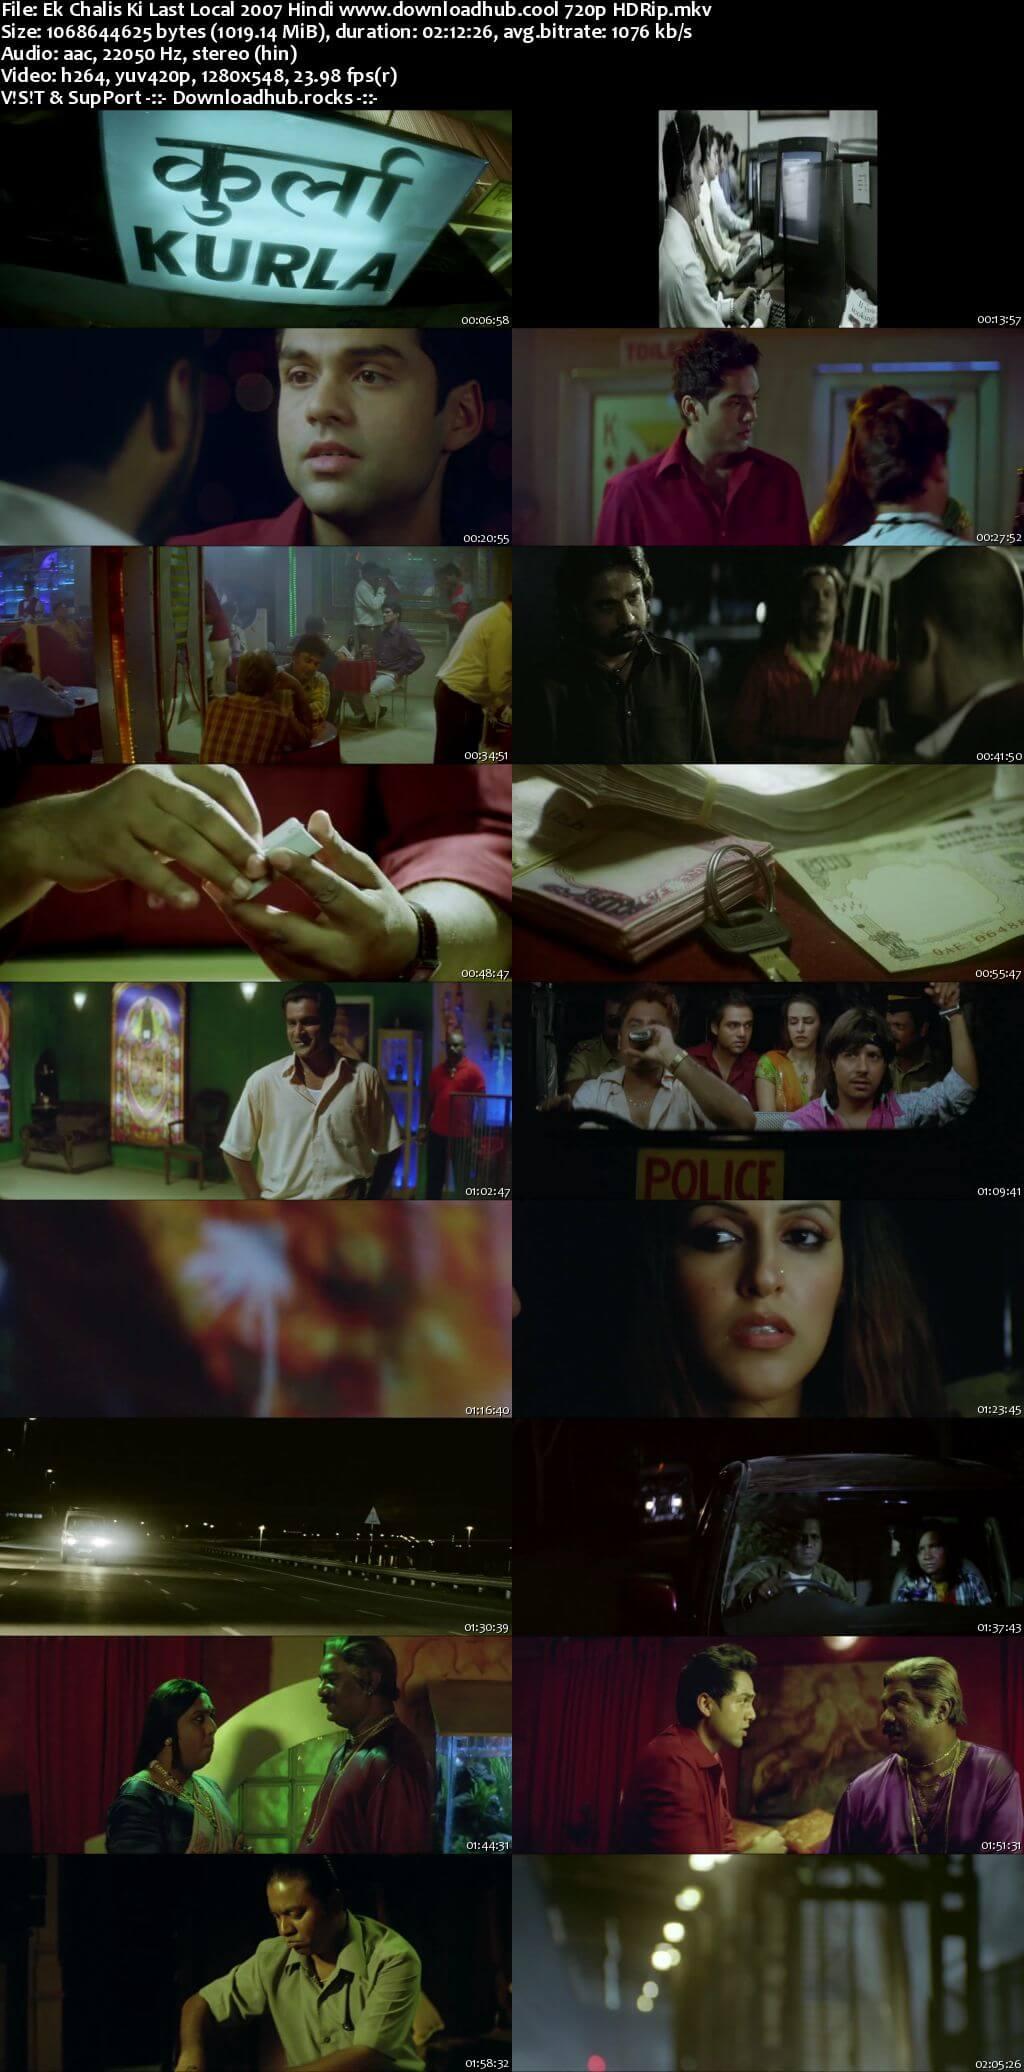 Ek Chalis Ki Last Local 2007 Hindi 720p HDRip x264